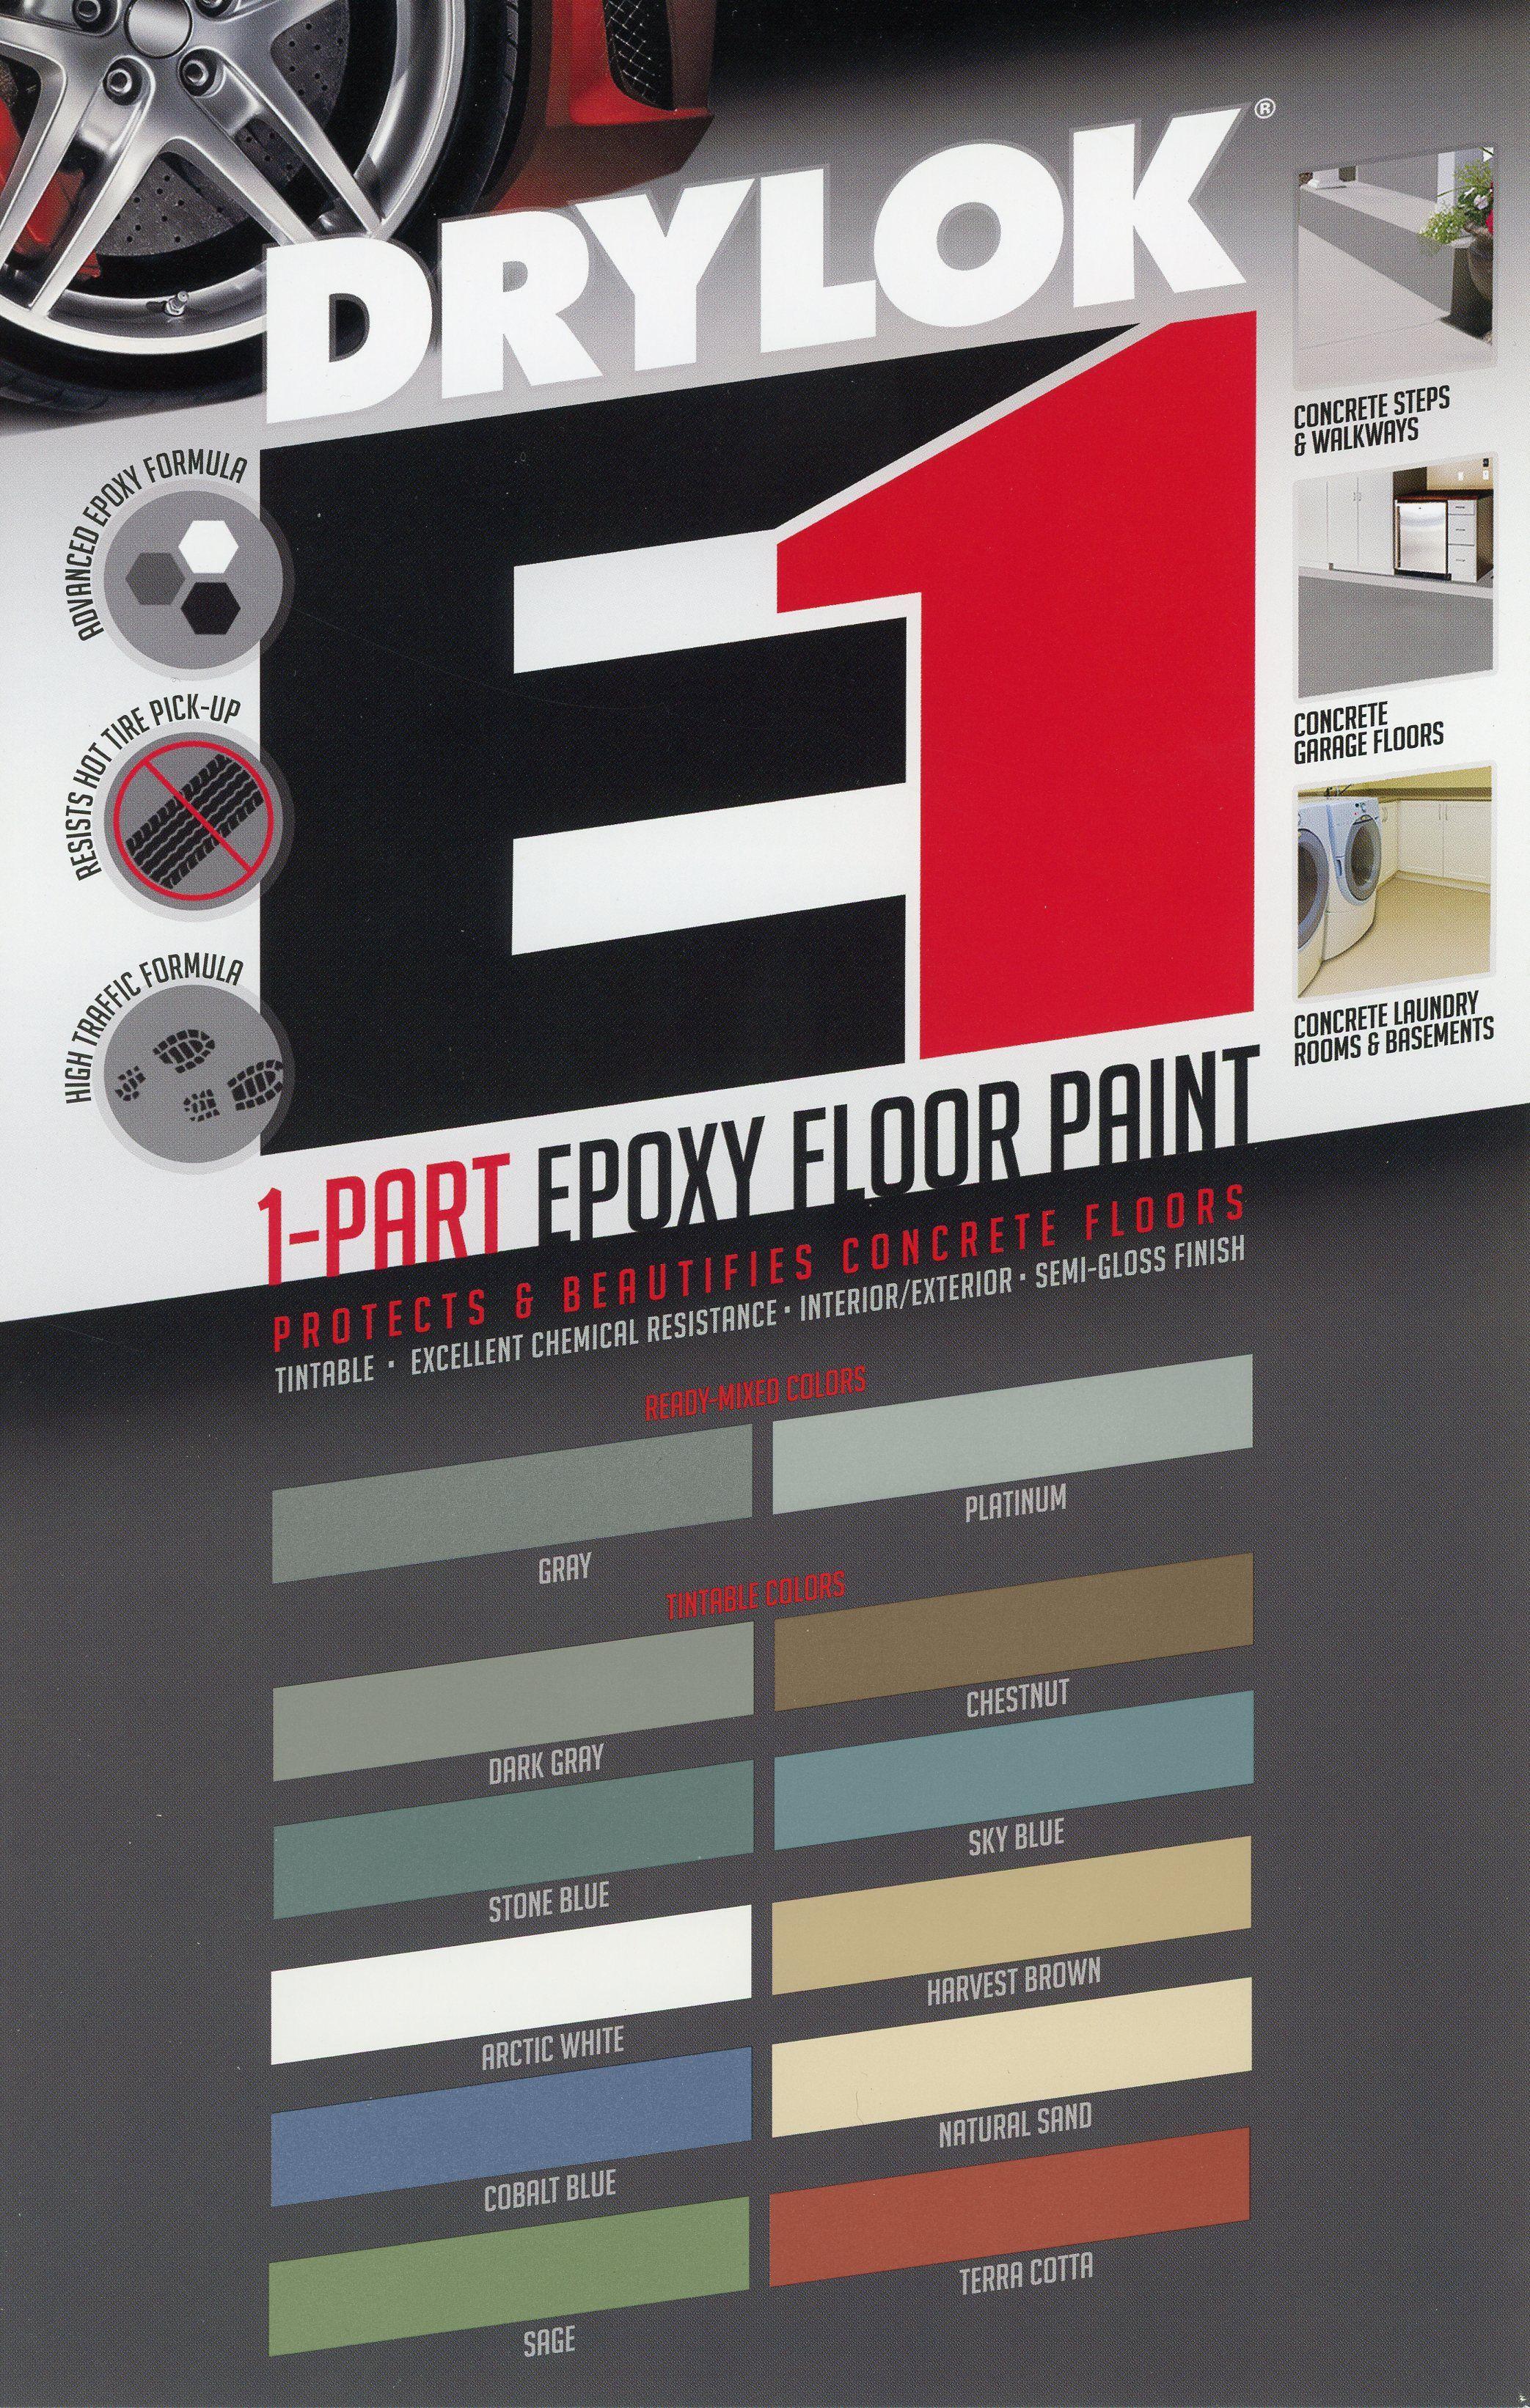 Drylok E1 Concrete Floor Paint Is Now Tintable Painted Floors Painted Concrete Floors Basement Makeover